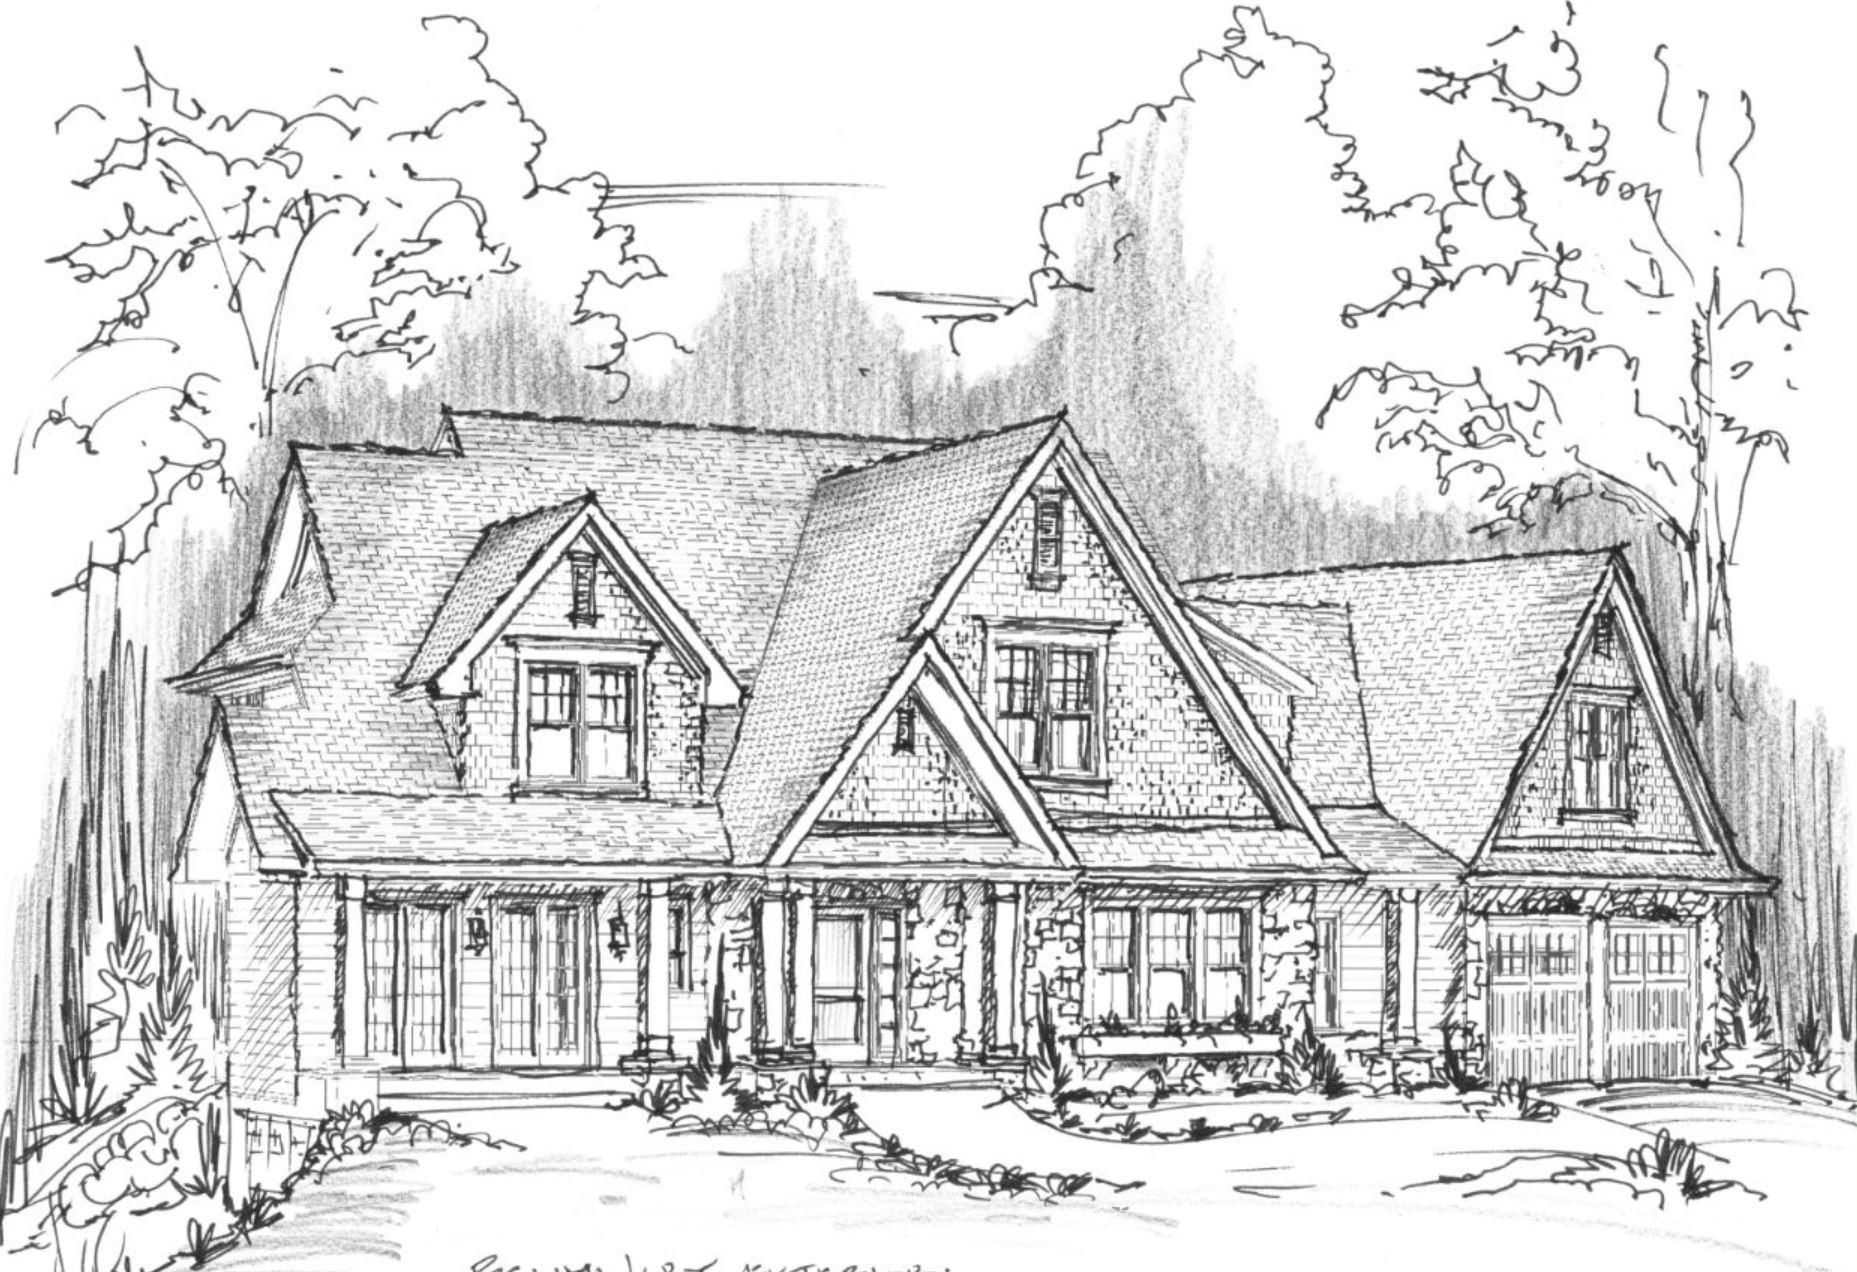 Edina New Build | Sketch